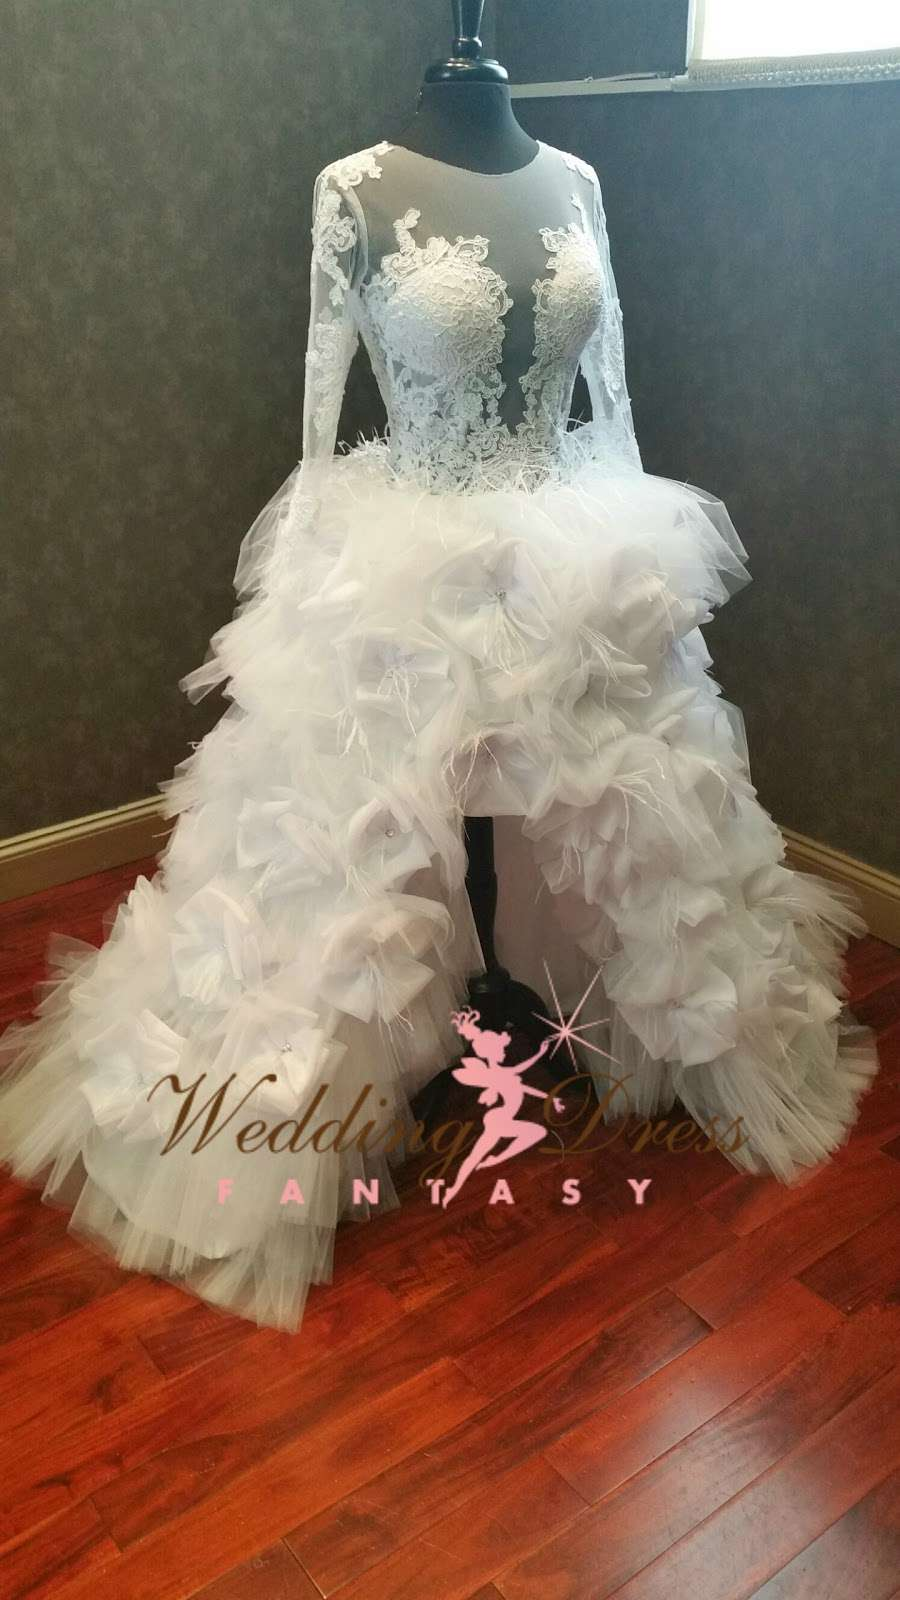 Couture de Bride - clothing store    Photo 10 of 10   Address: 406 Cedar Ln, Teaneck, NJ 07666, USA   Phone: (201) 357-4877